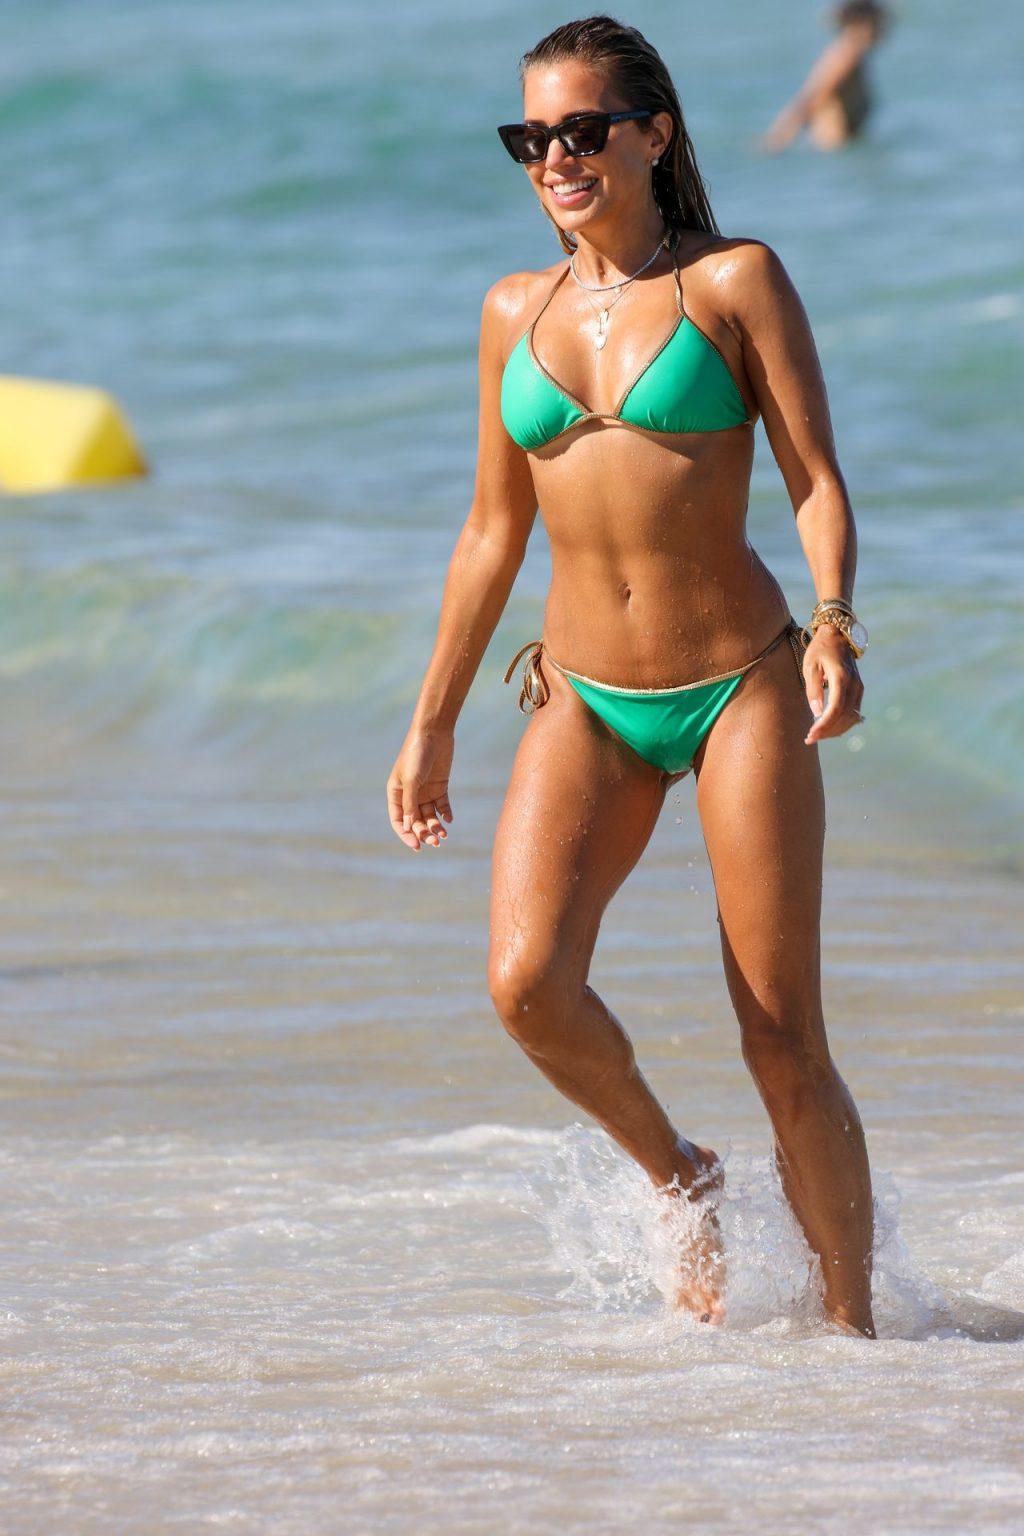 Sylvie Meis & Niclas Castello Enjoy a Beach Day in Saint Tropez (48 Photos)